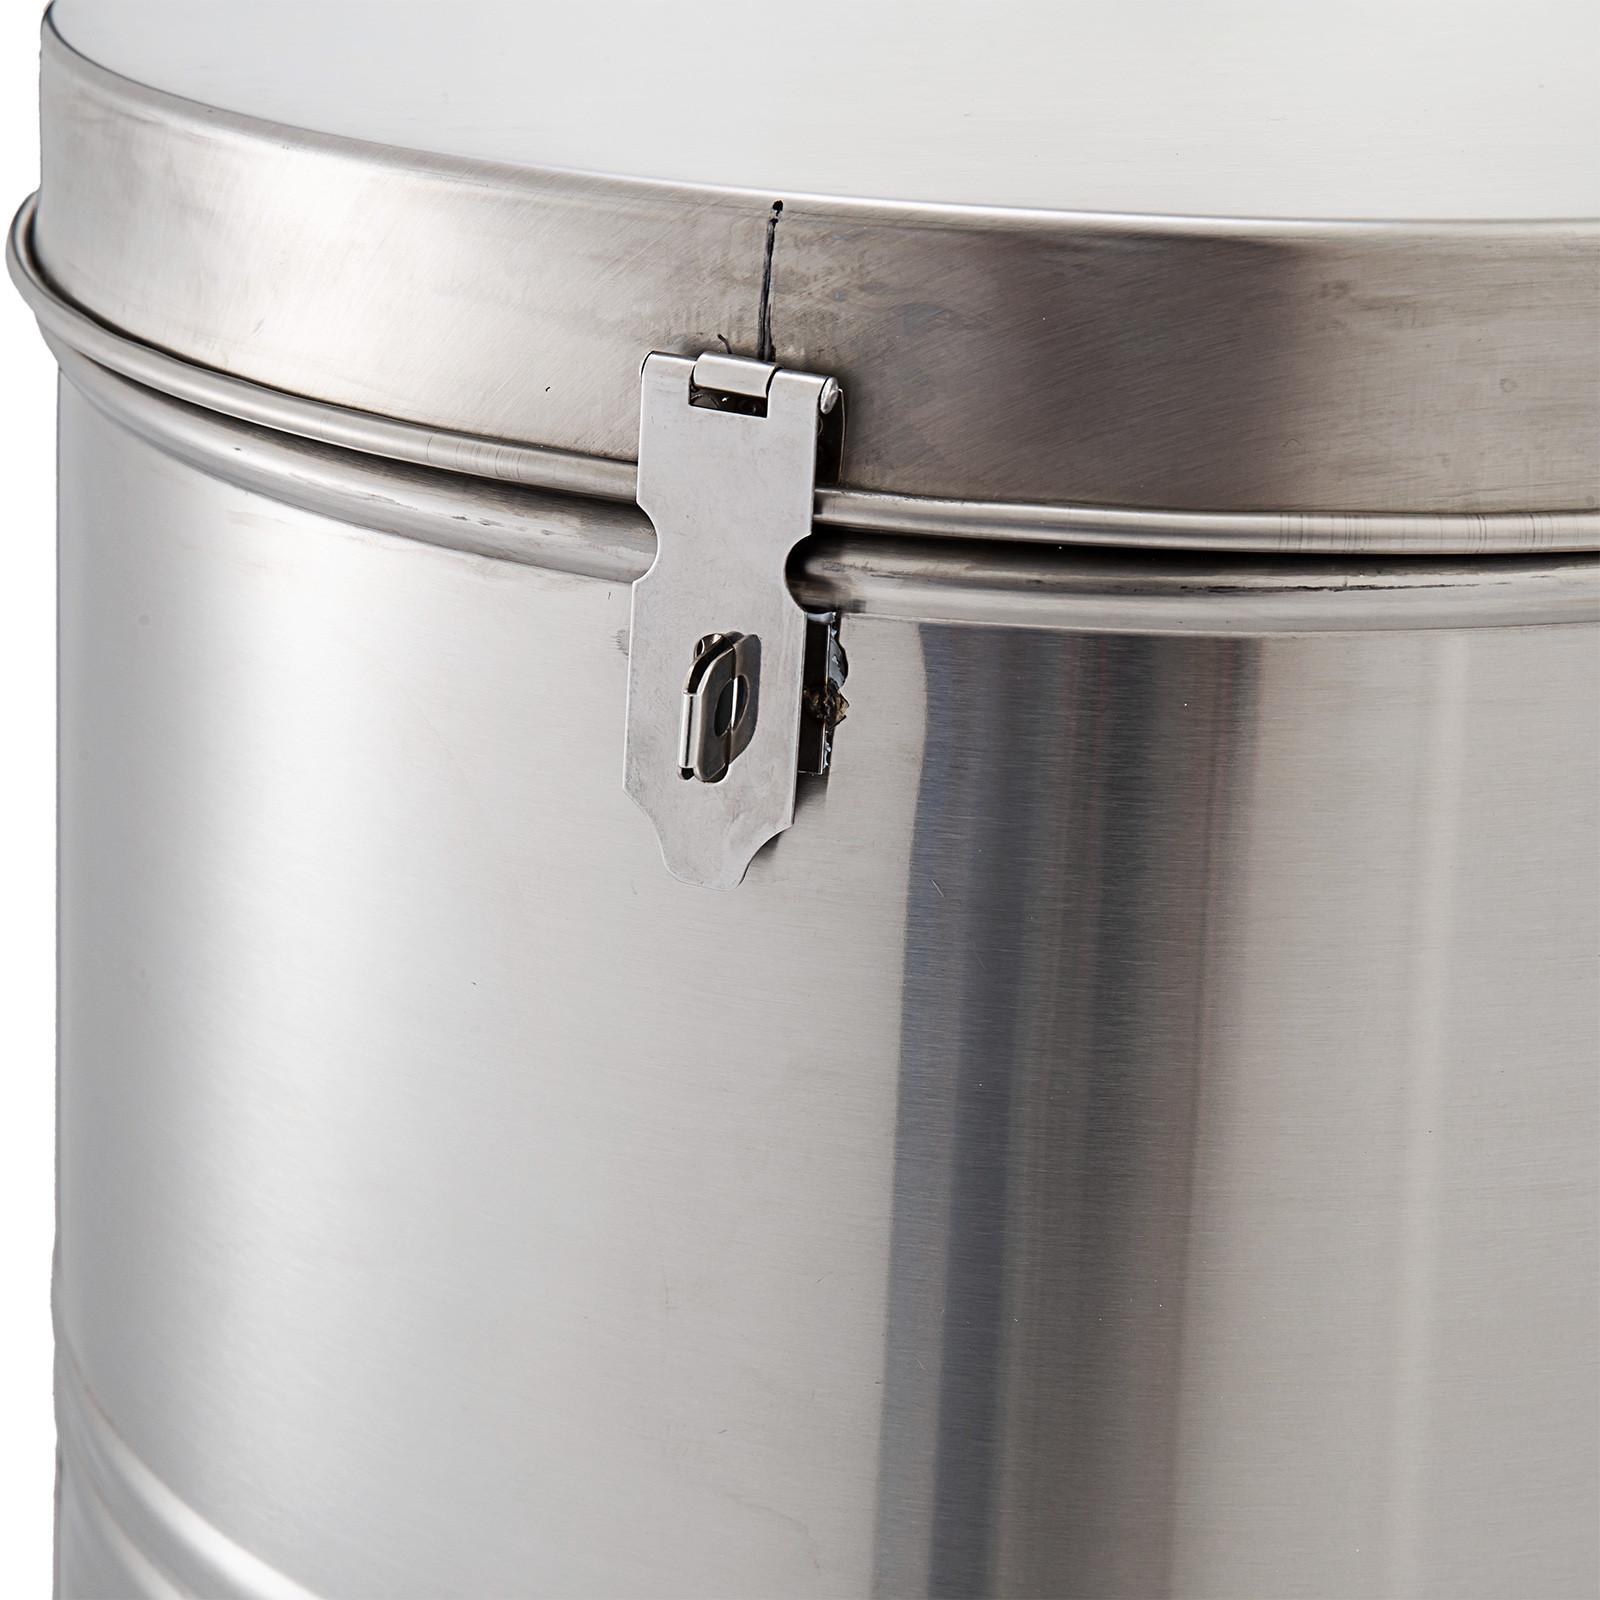 Extracteur-de-Miel-Electrique-manuelle-2-3-4-Cadres-En-Acier-Inox-Centrifugeuse miniature 23